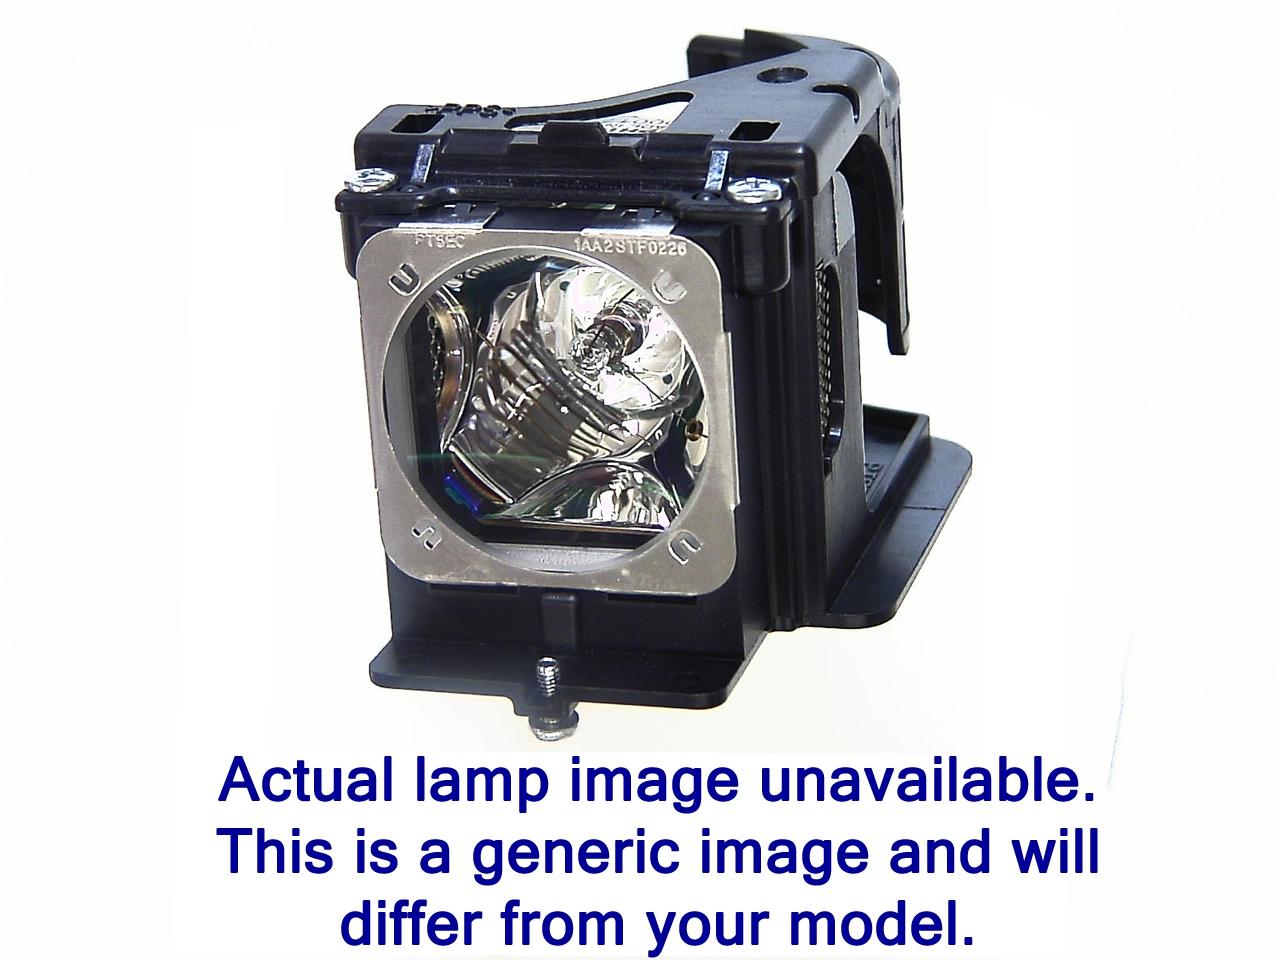 Lámpara RCA HDLP60W164